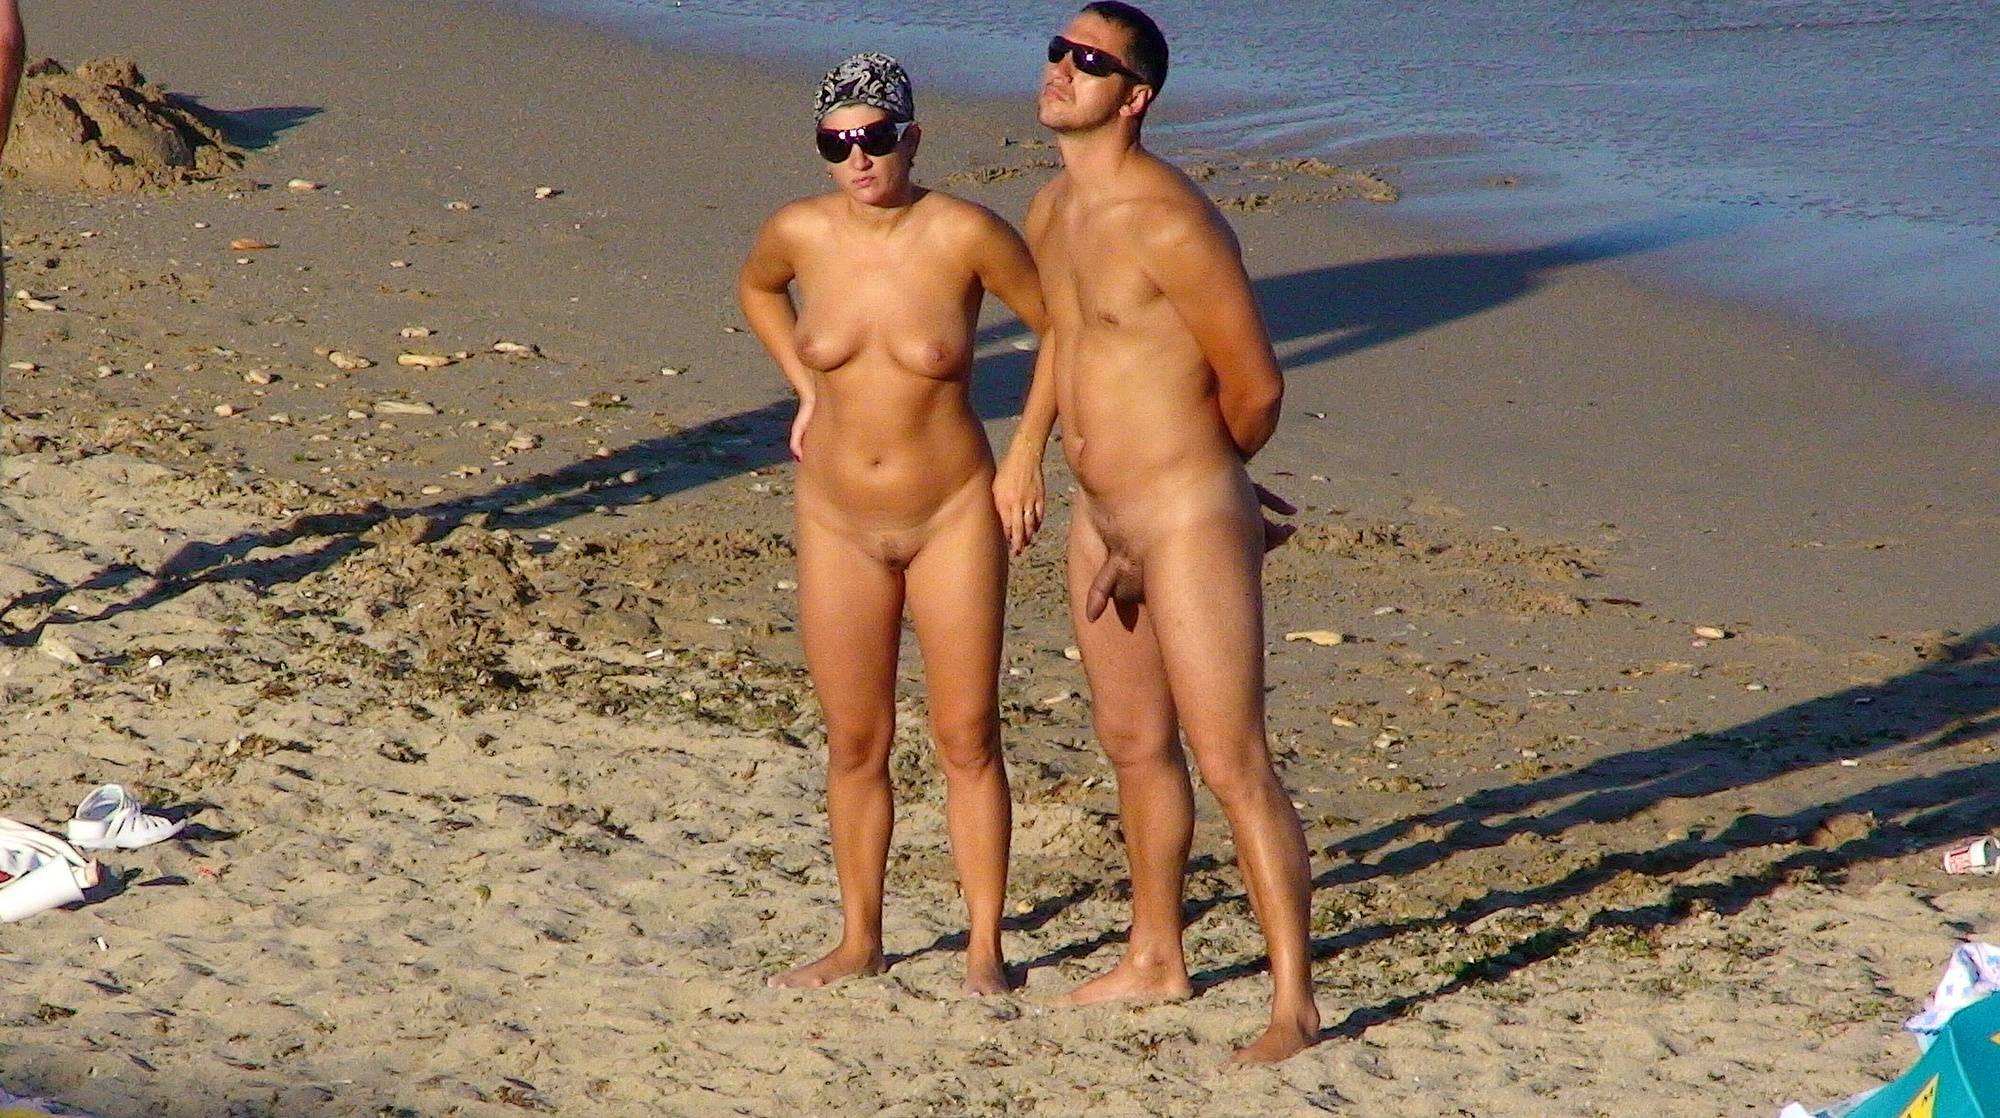 Purenudism Pics Romanian Beach Series - 1